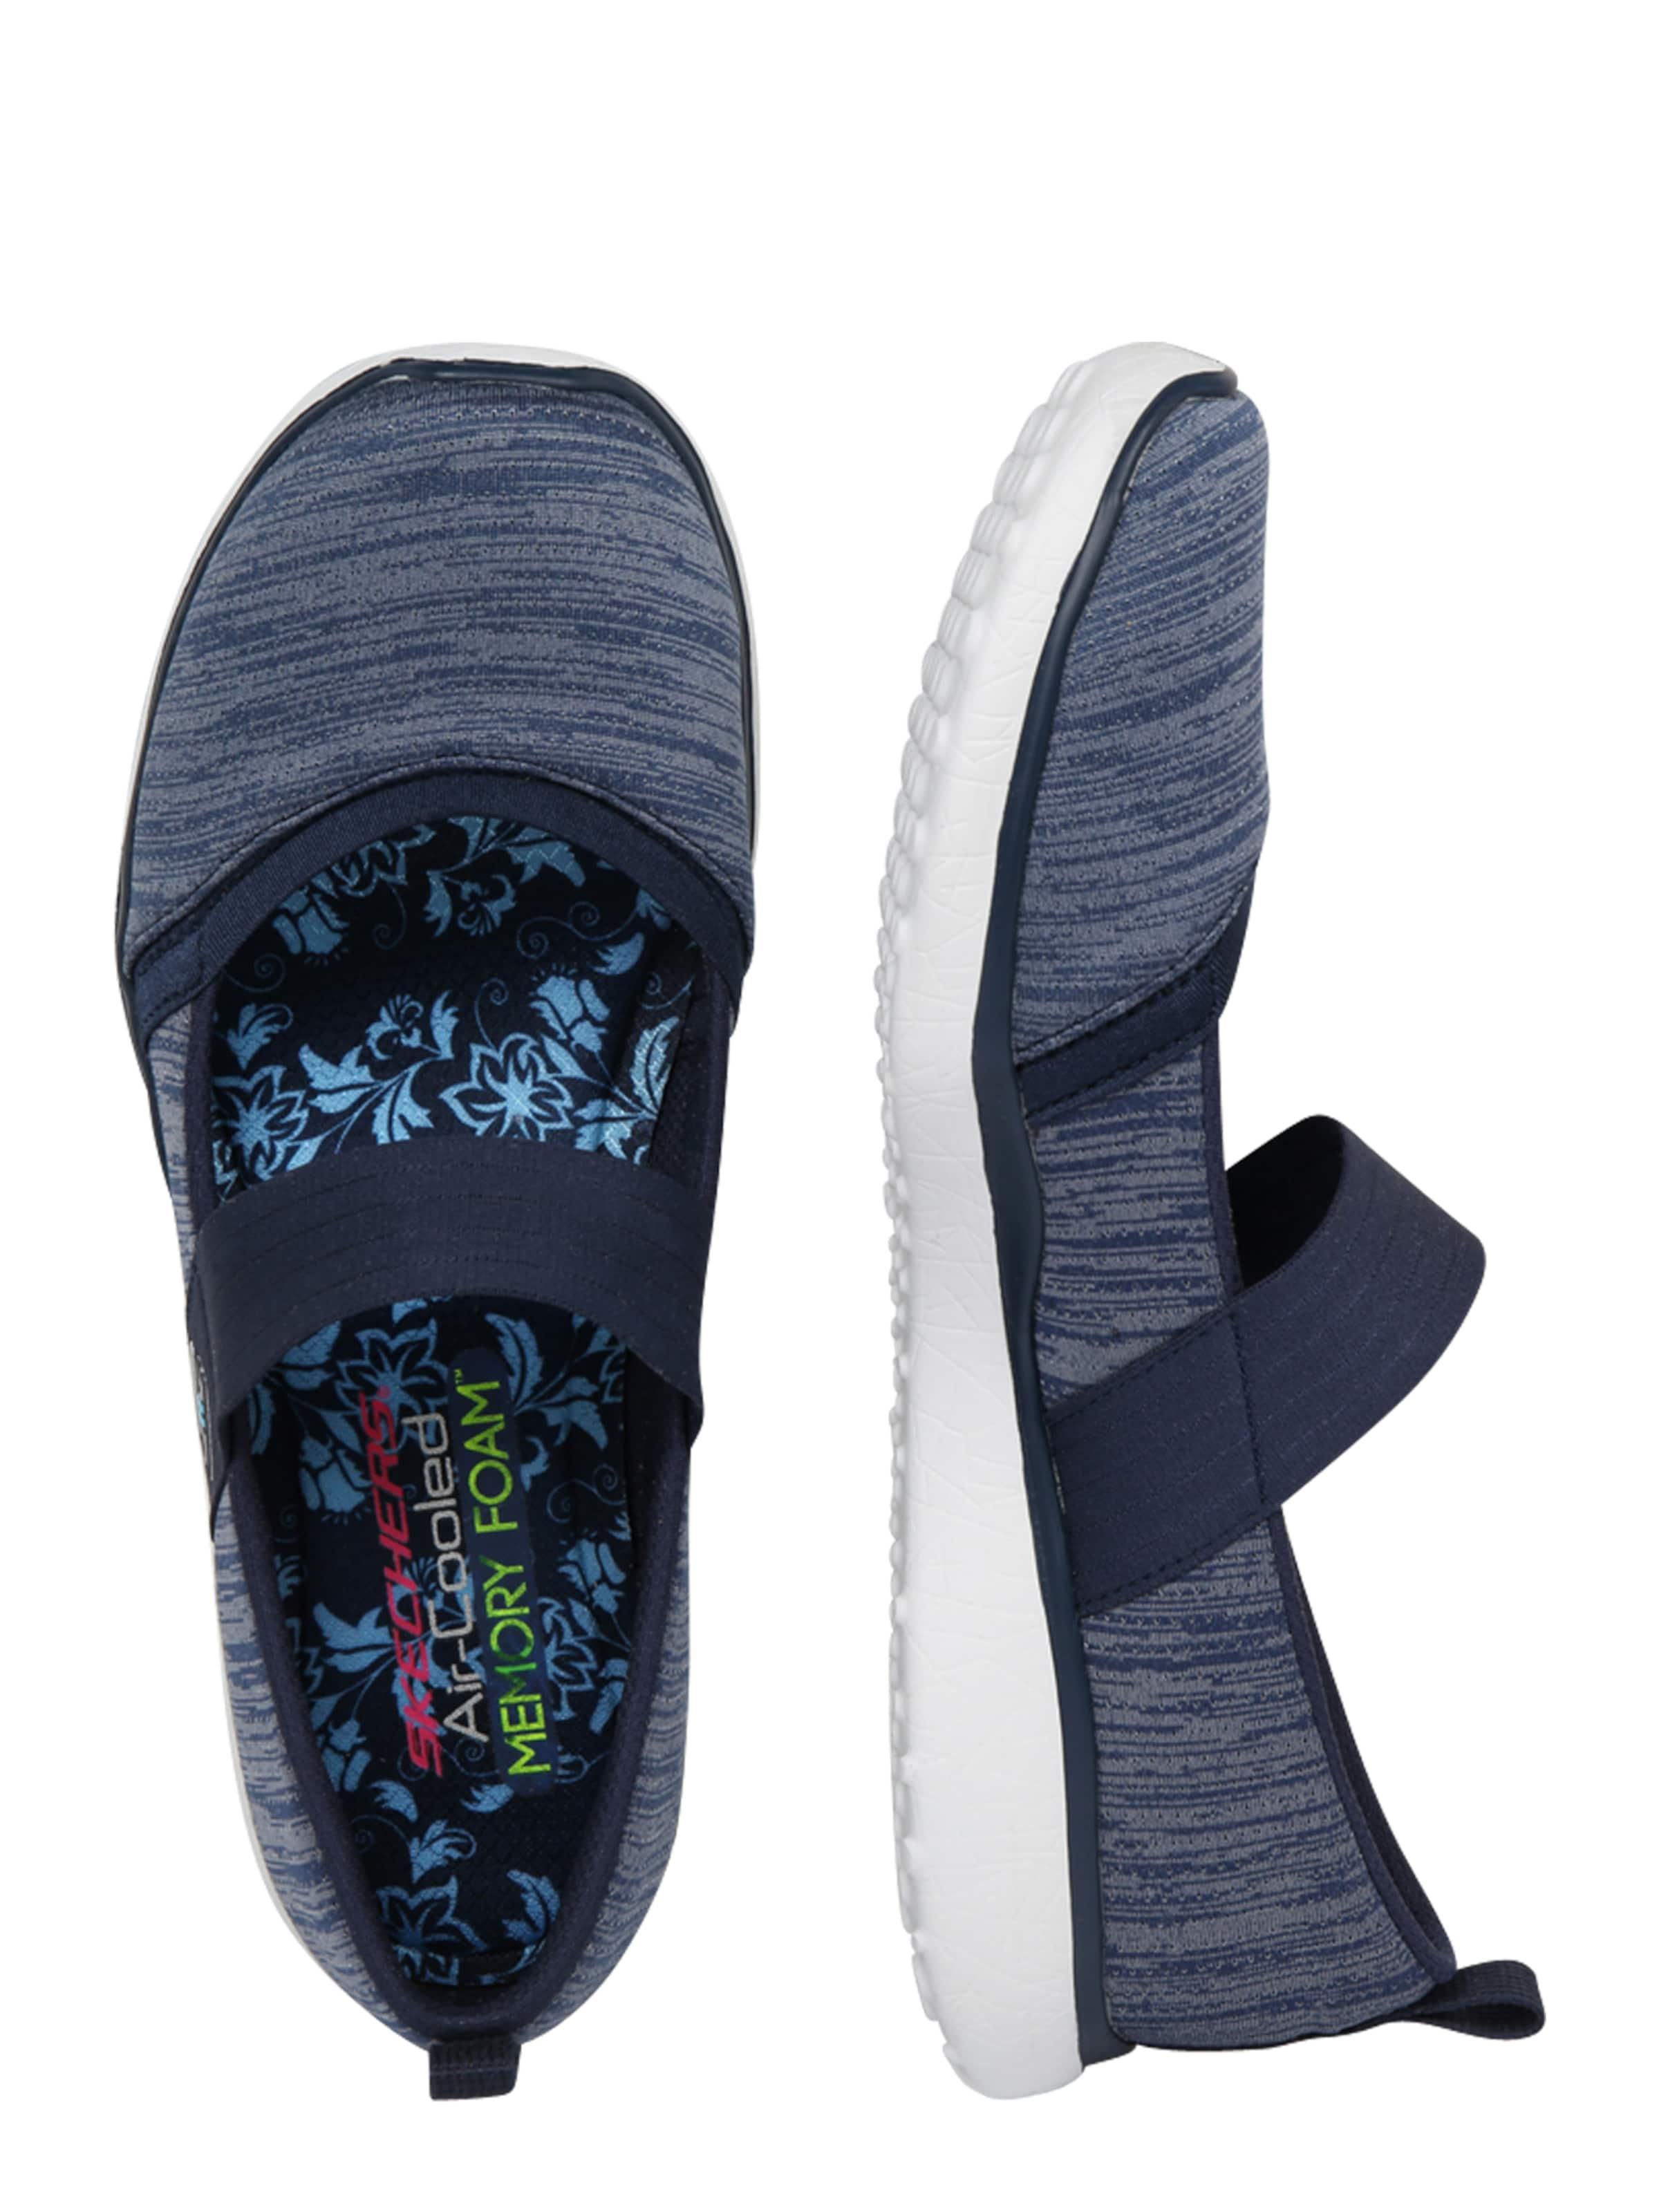 Marine Bleu 'microburst' Skechers En Chaussons XuOlPZwkiT